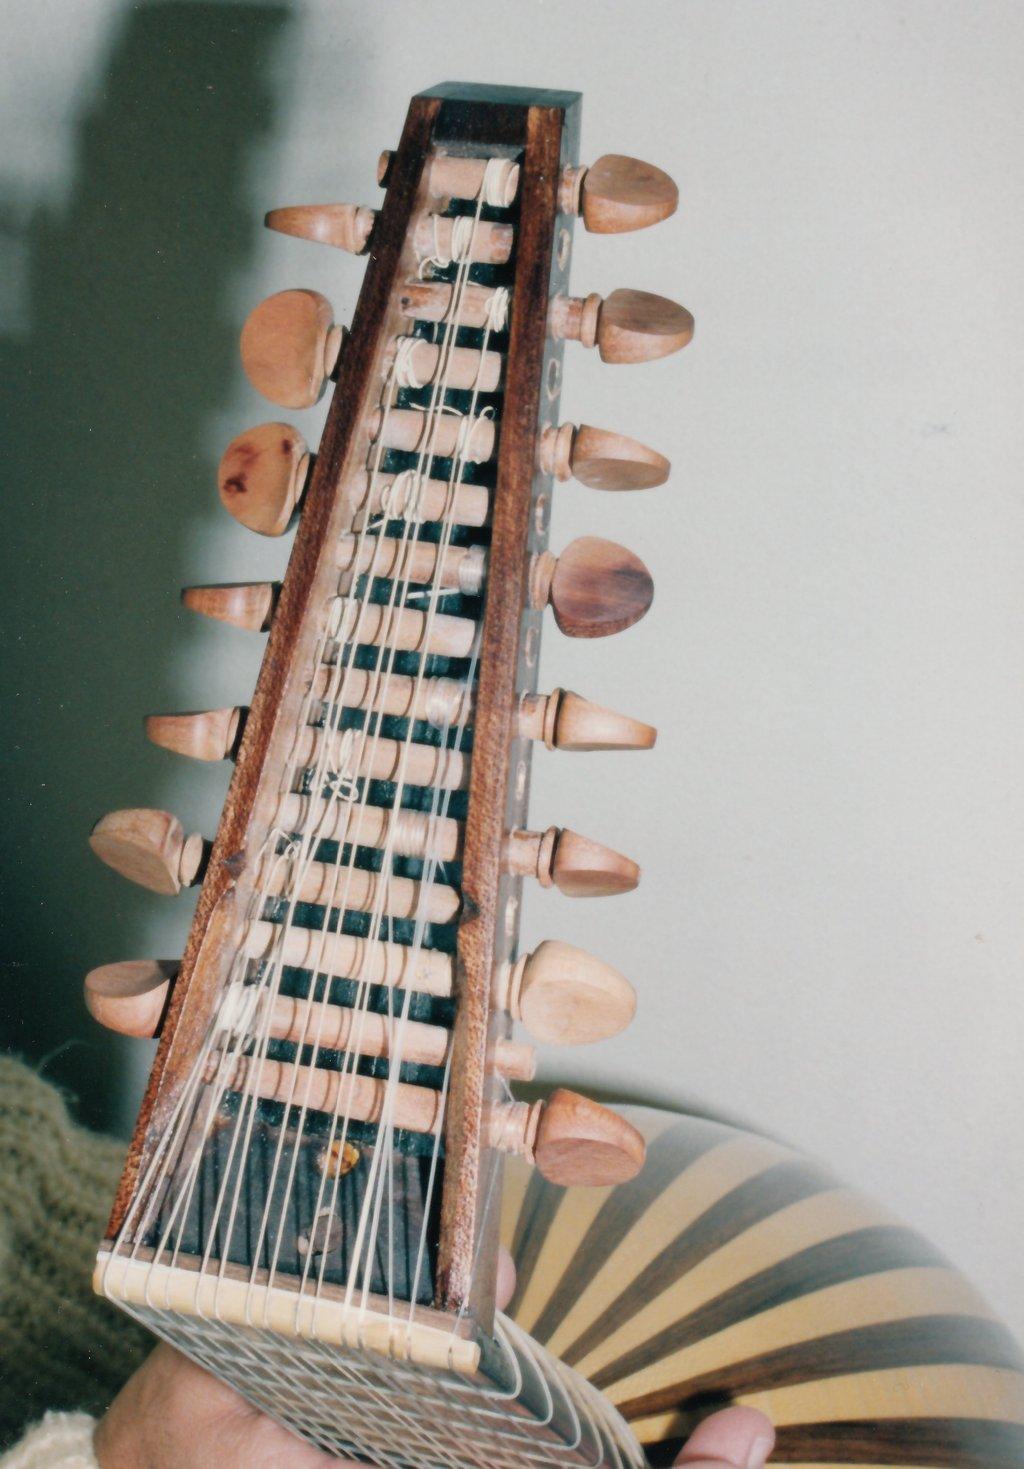 Fabrication d'instruments de musique anciens de bgire 19111306455223134916508261